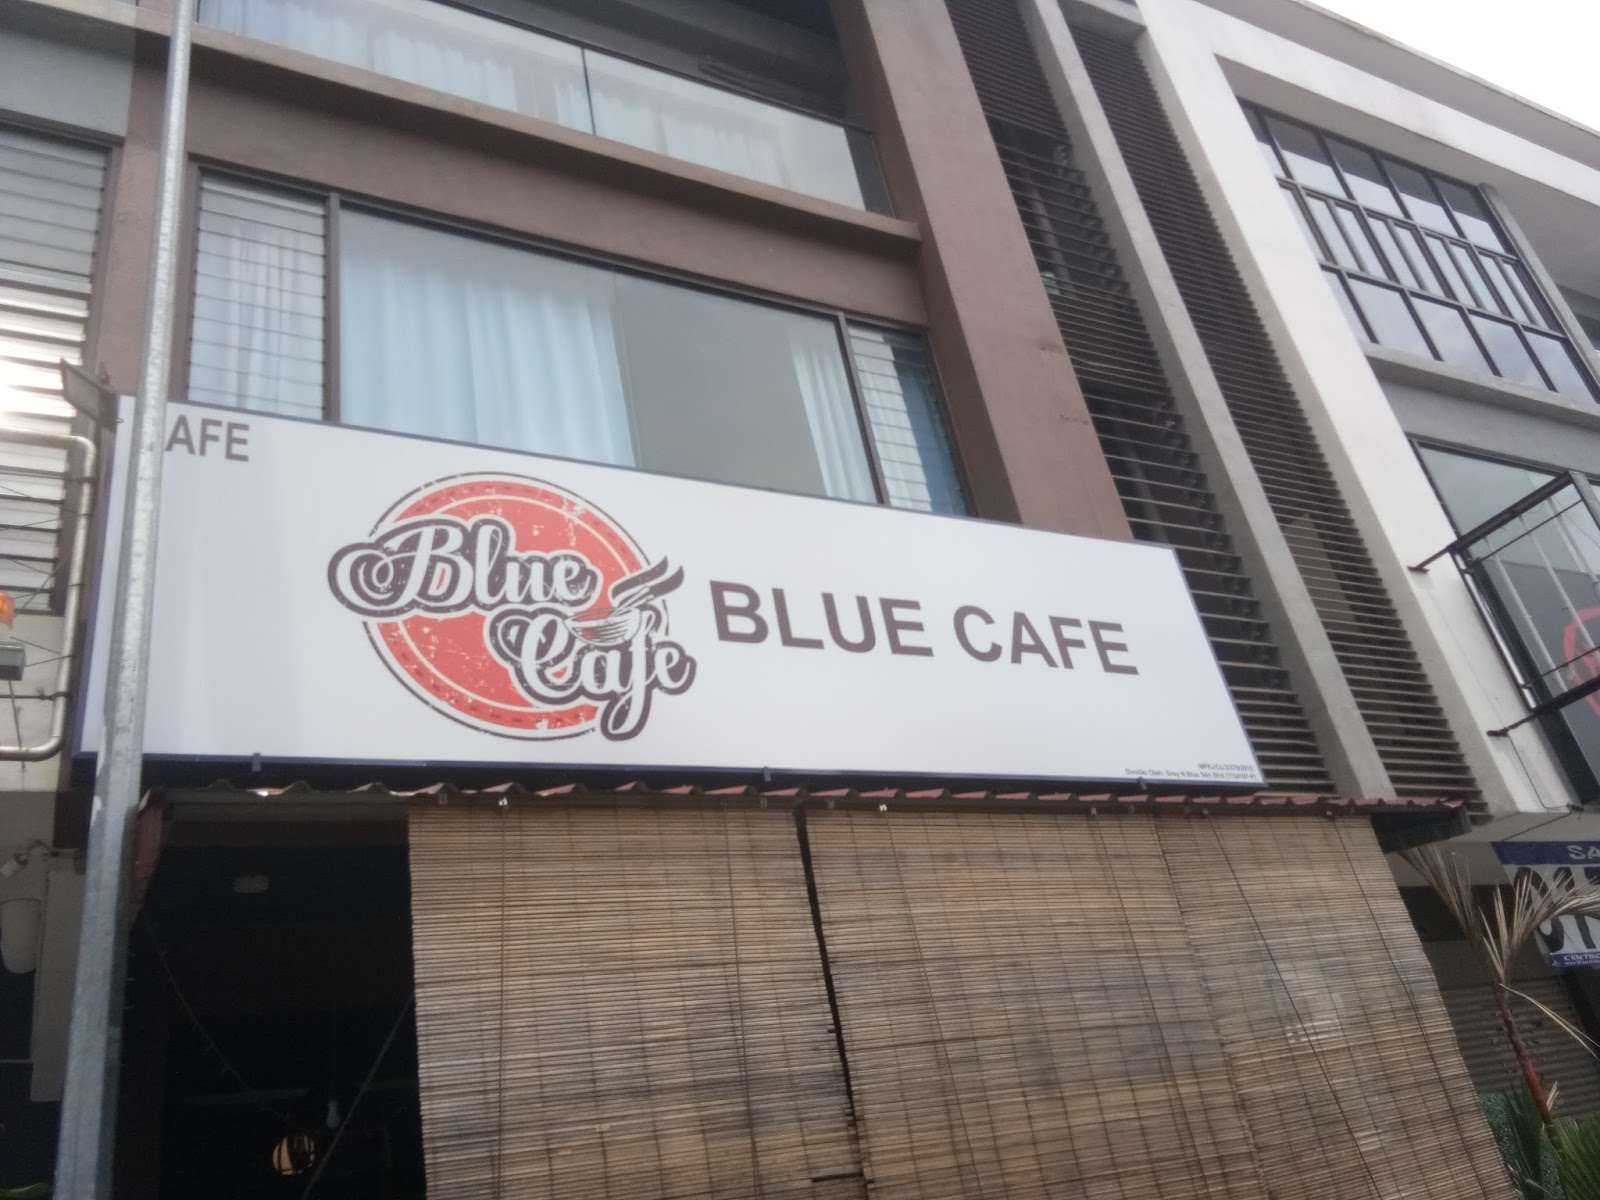 Blue Cafe Bandar Mahkota Cheras Cerita Suka Suka Qurratul Halwa